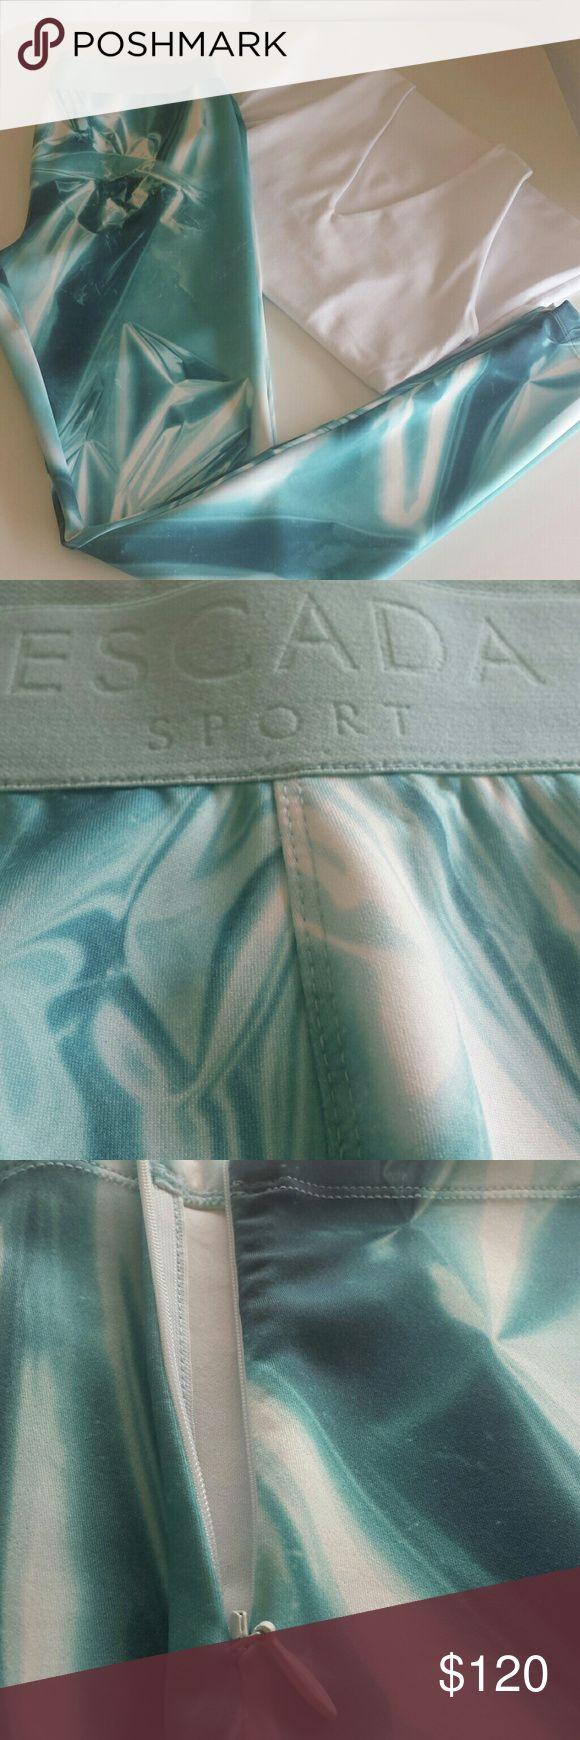 ESCADA SPORT EPRINTA - Leggings - turquoise ESCADA SPORT leggings. Ankle zipper option.  90% polyester 10% spandex. Escada Pants Leggings